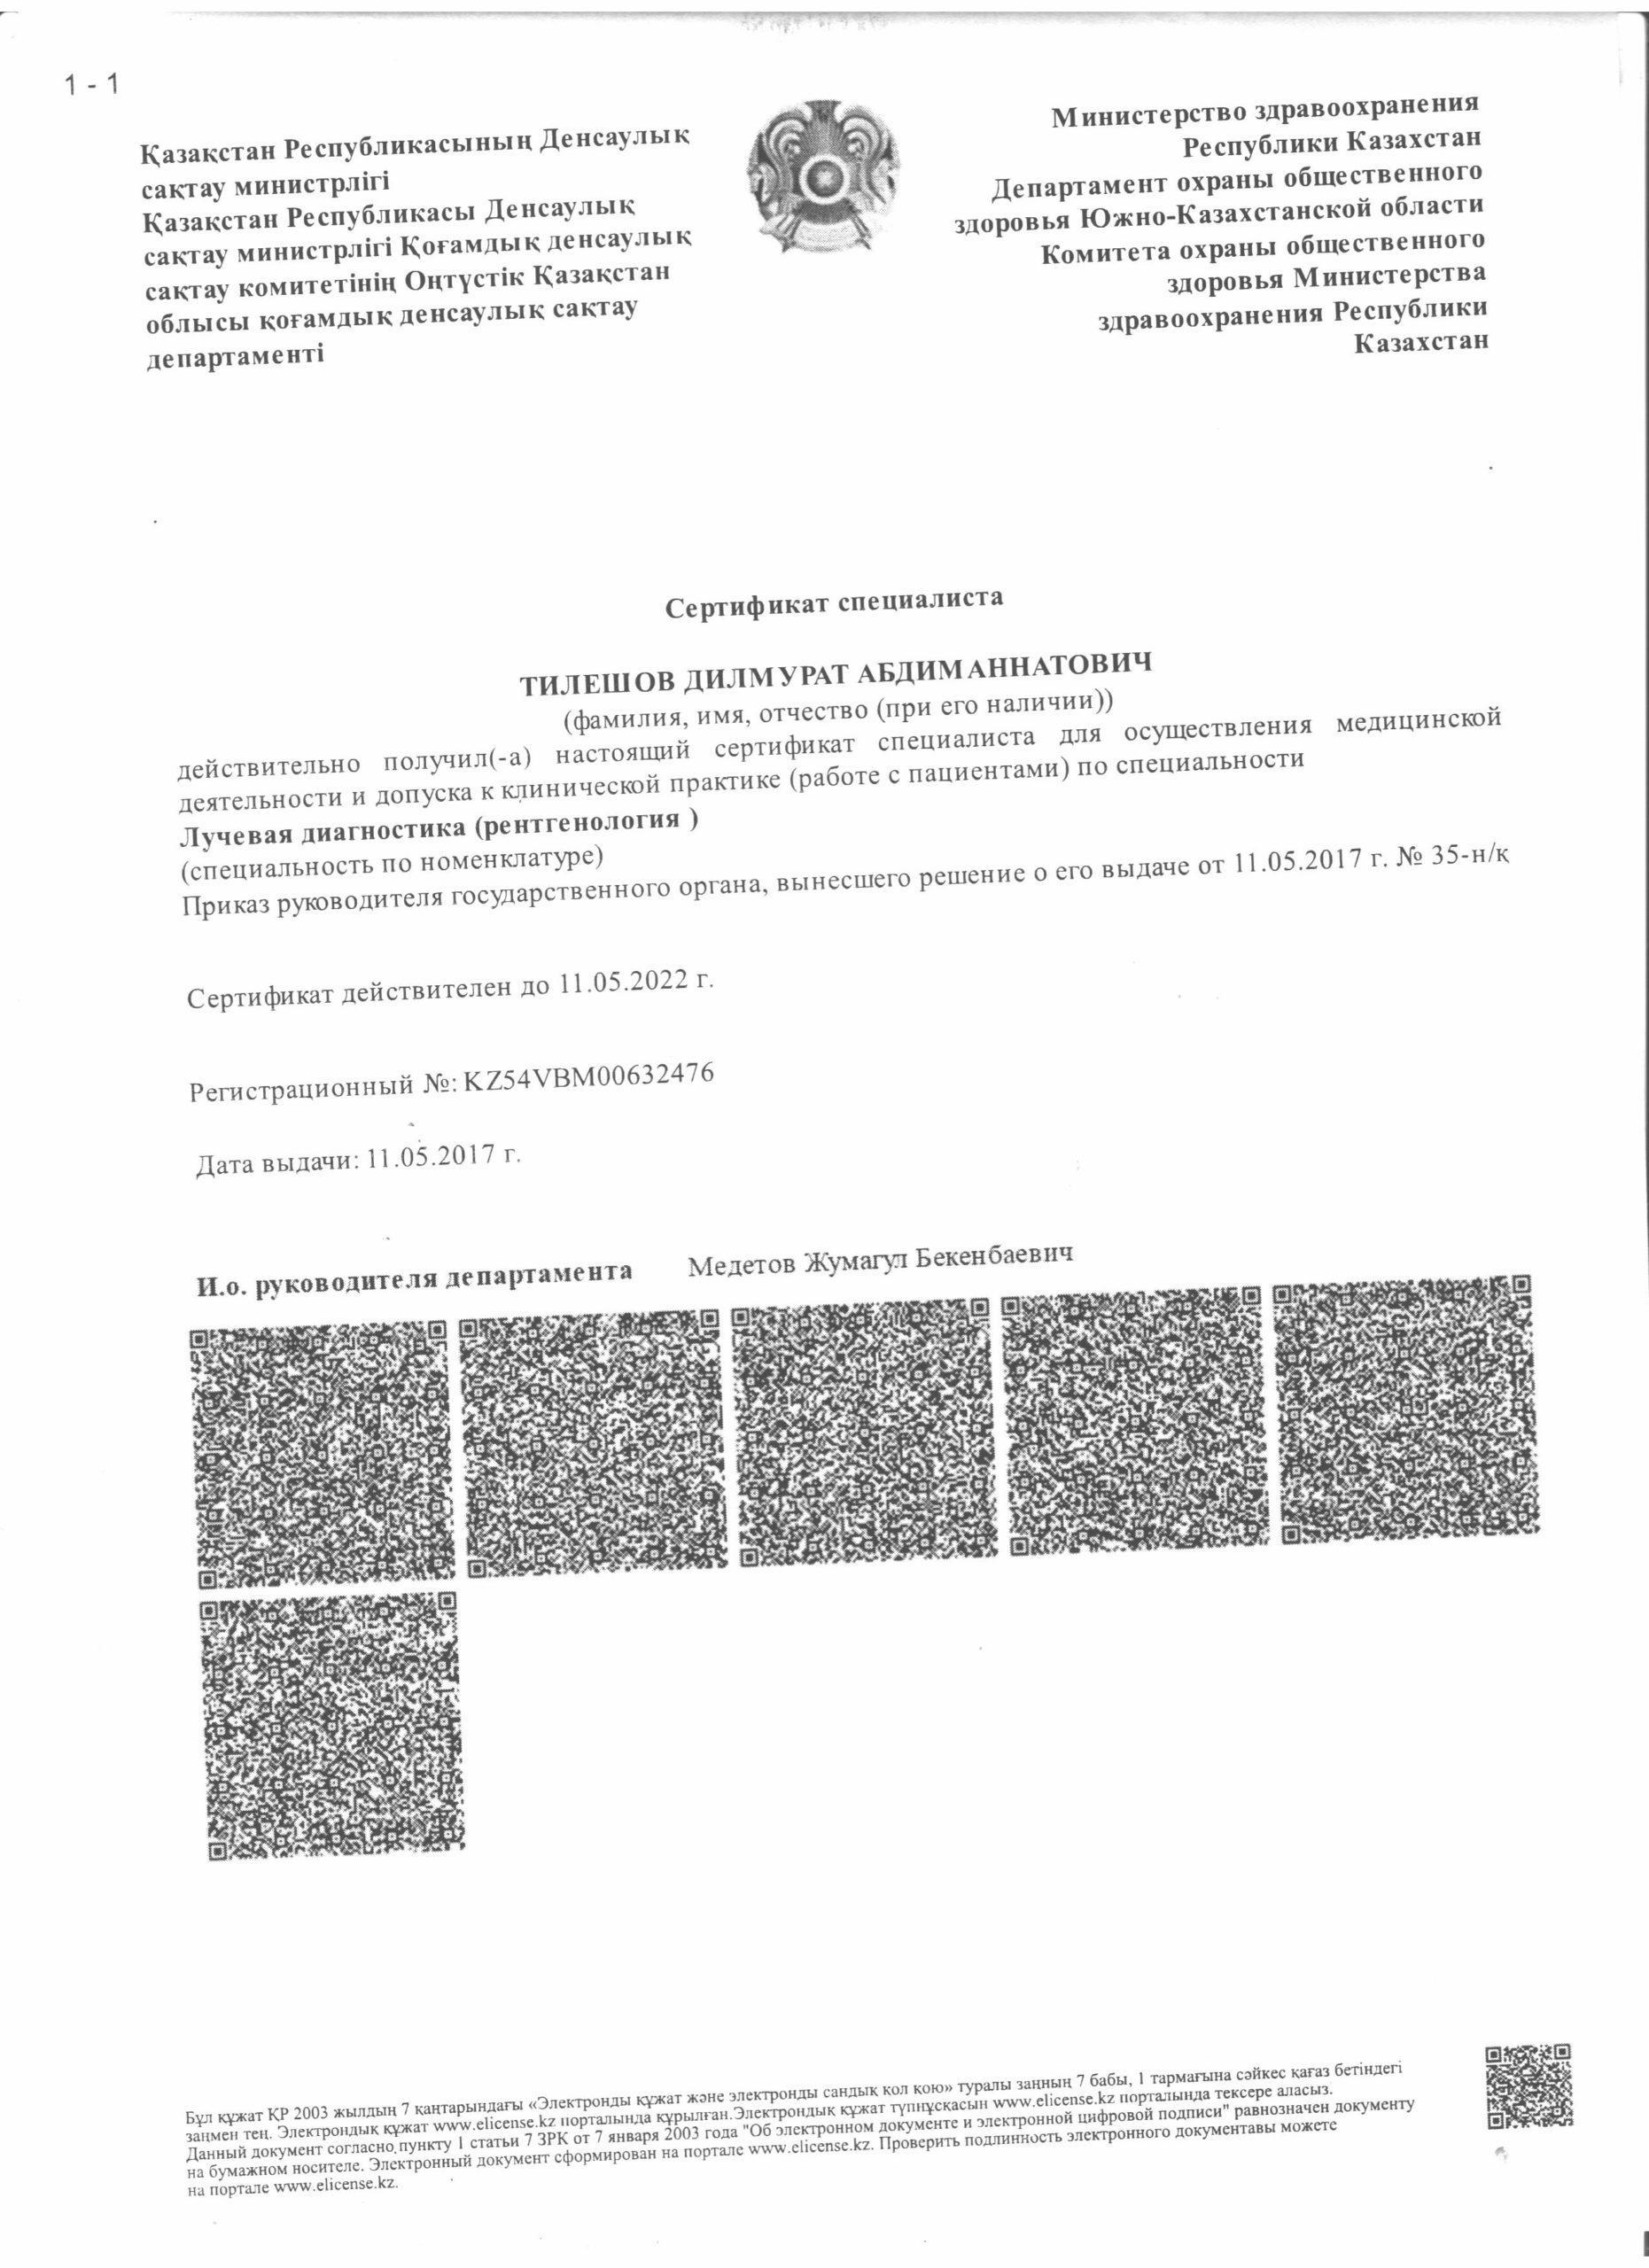 Сертификат рентгенологии клиники Akniet Shipa сайрамский р-н. с. Карабулак